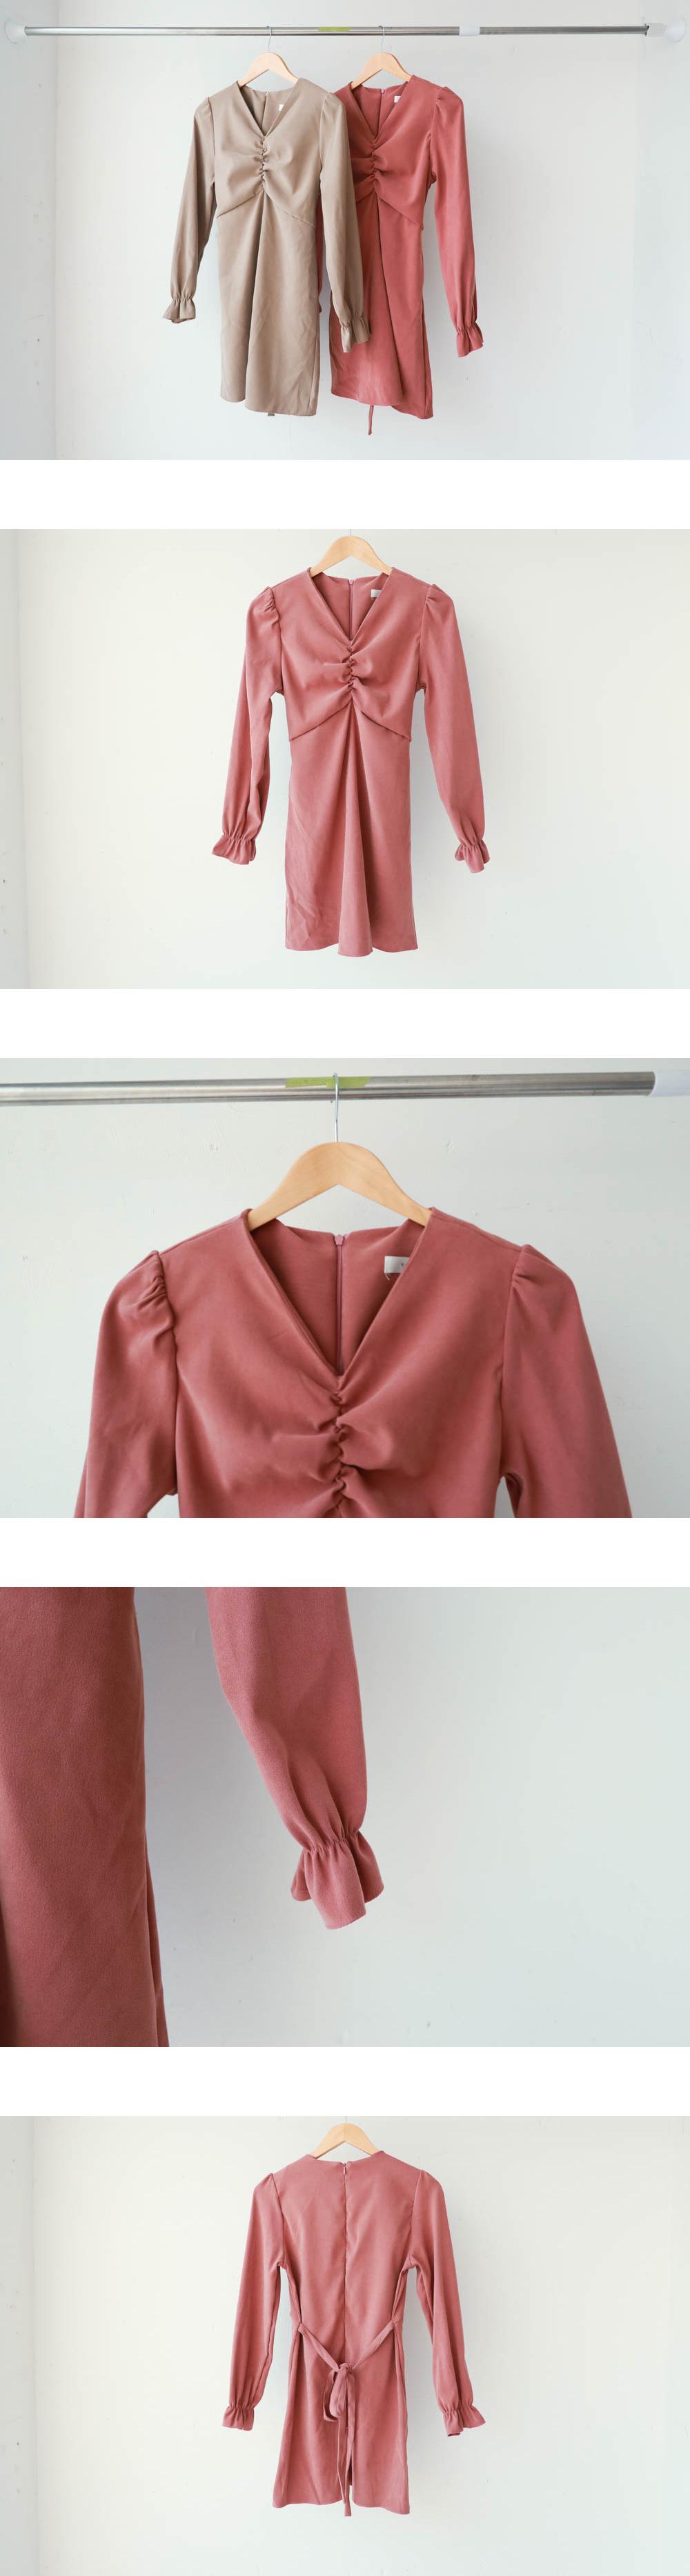 Front shearing V-neck dress